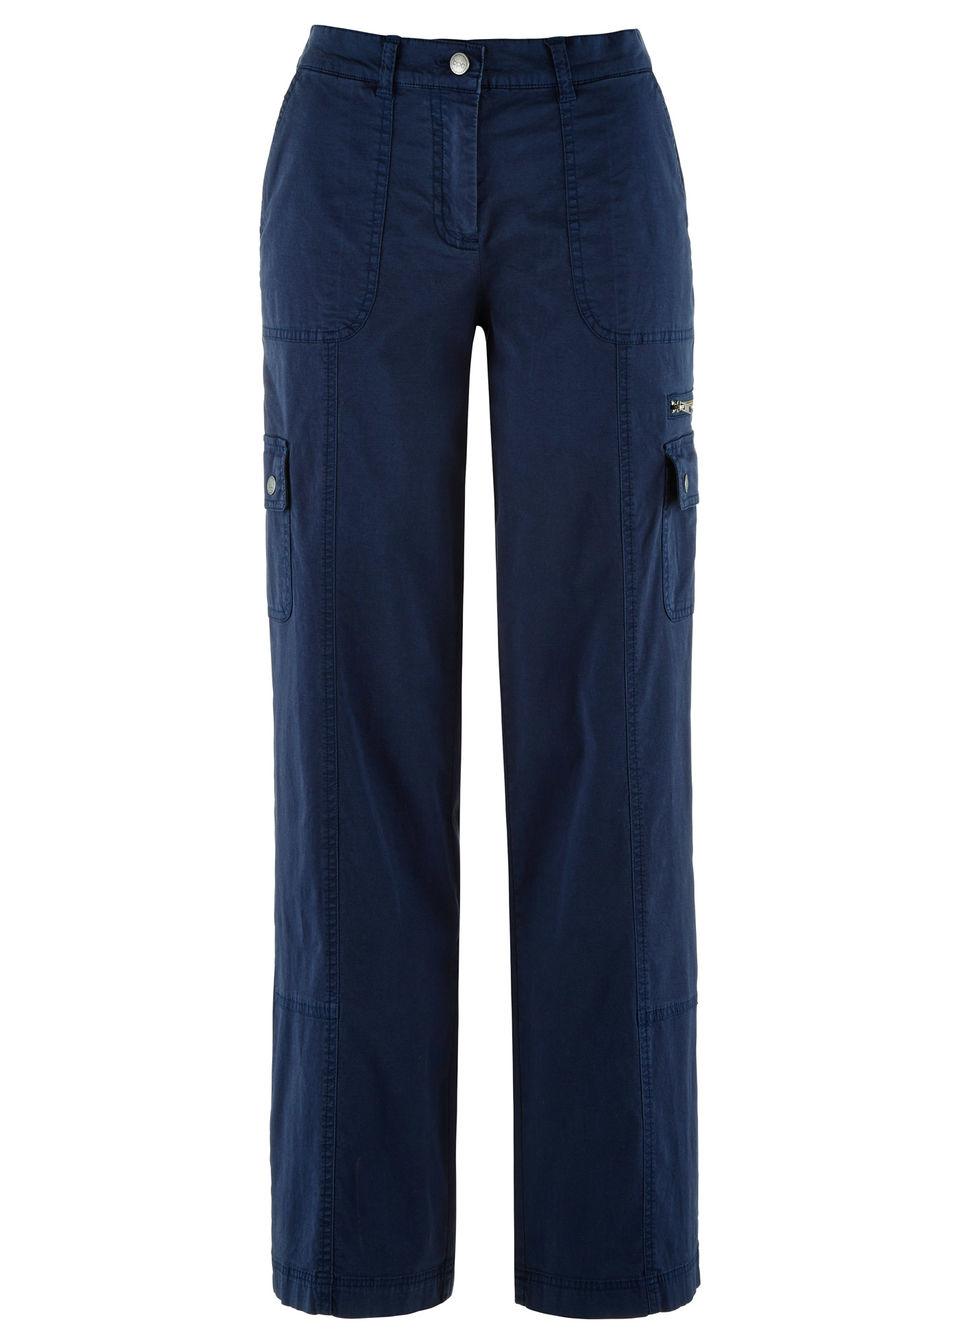 Pantaloni Papertouch cu croi larg bonprix